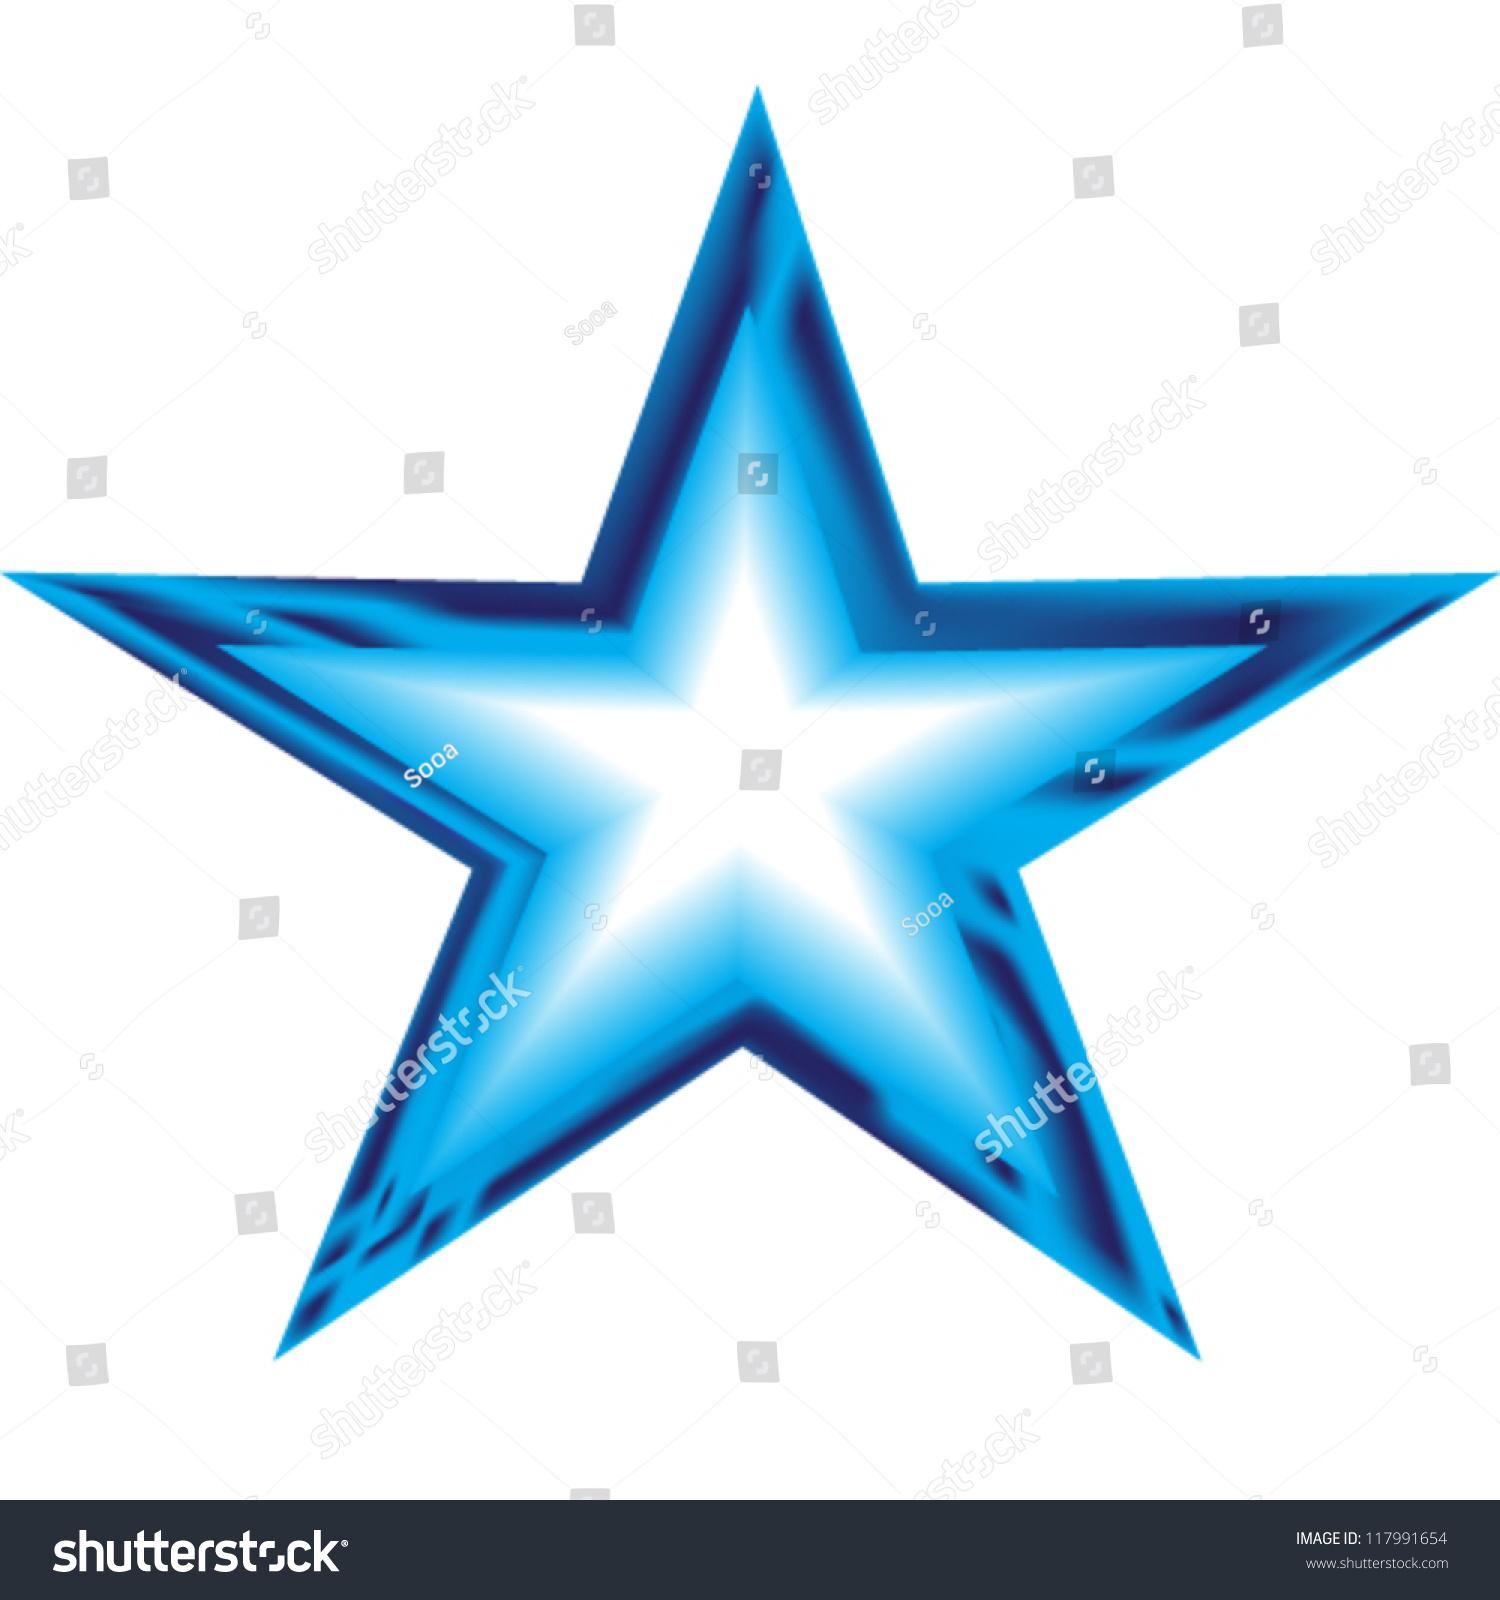 Blue Star Illustration Stock Vector 117991654 - Shutterstock